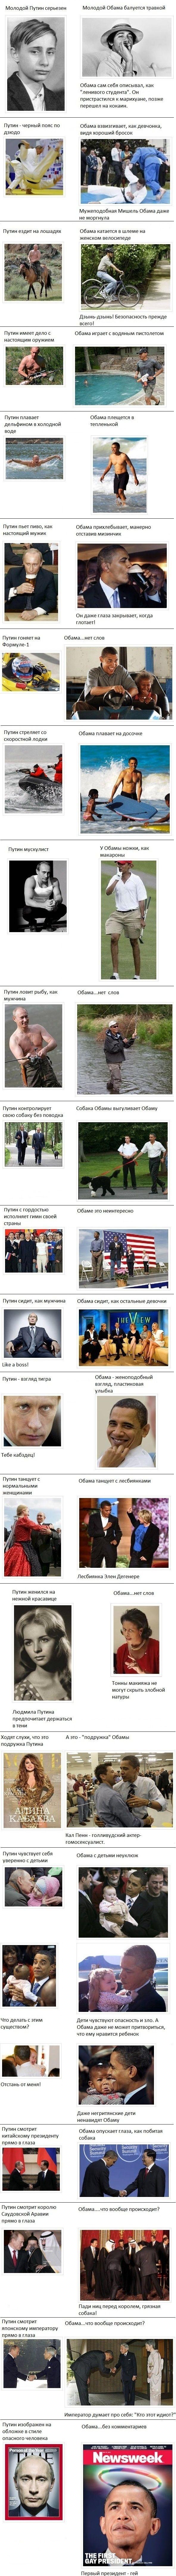 ihost_1380397016__obama-putin-krasivye-f